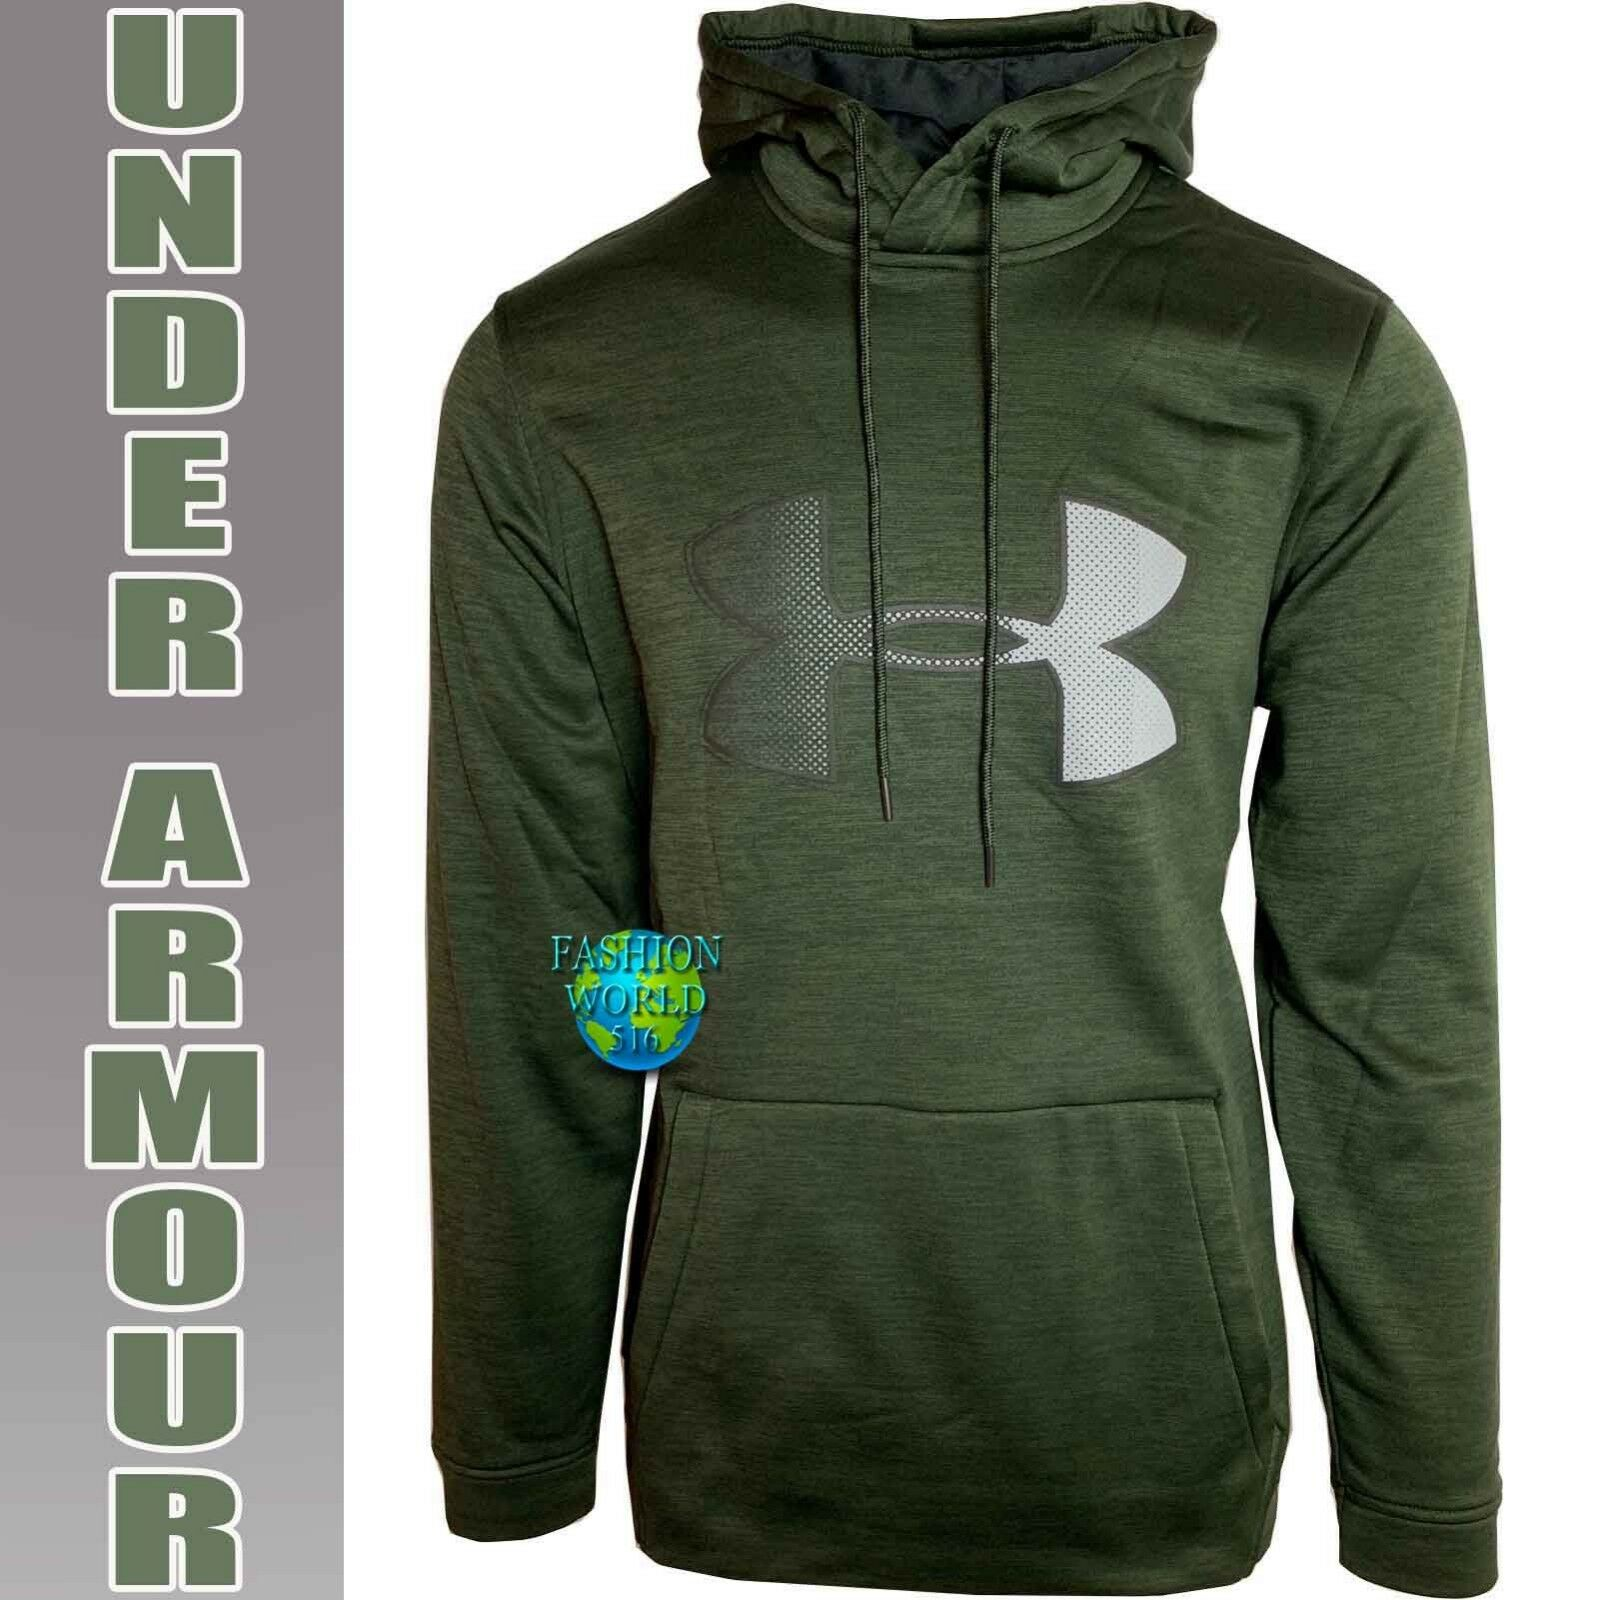 Under Armour Men/'s AF Graphic Logo Fleece Hoodie 1321734